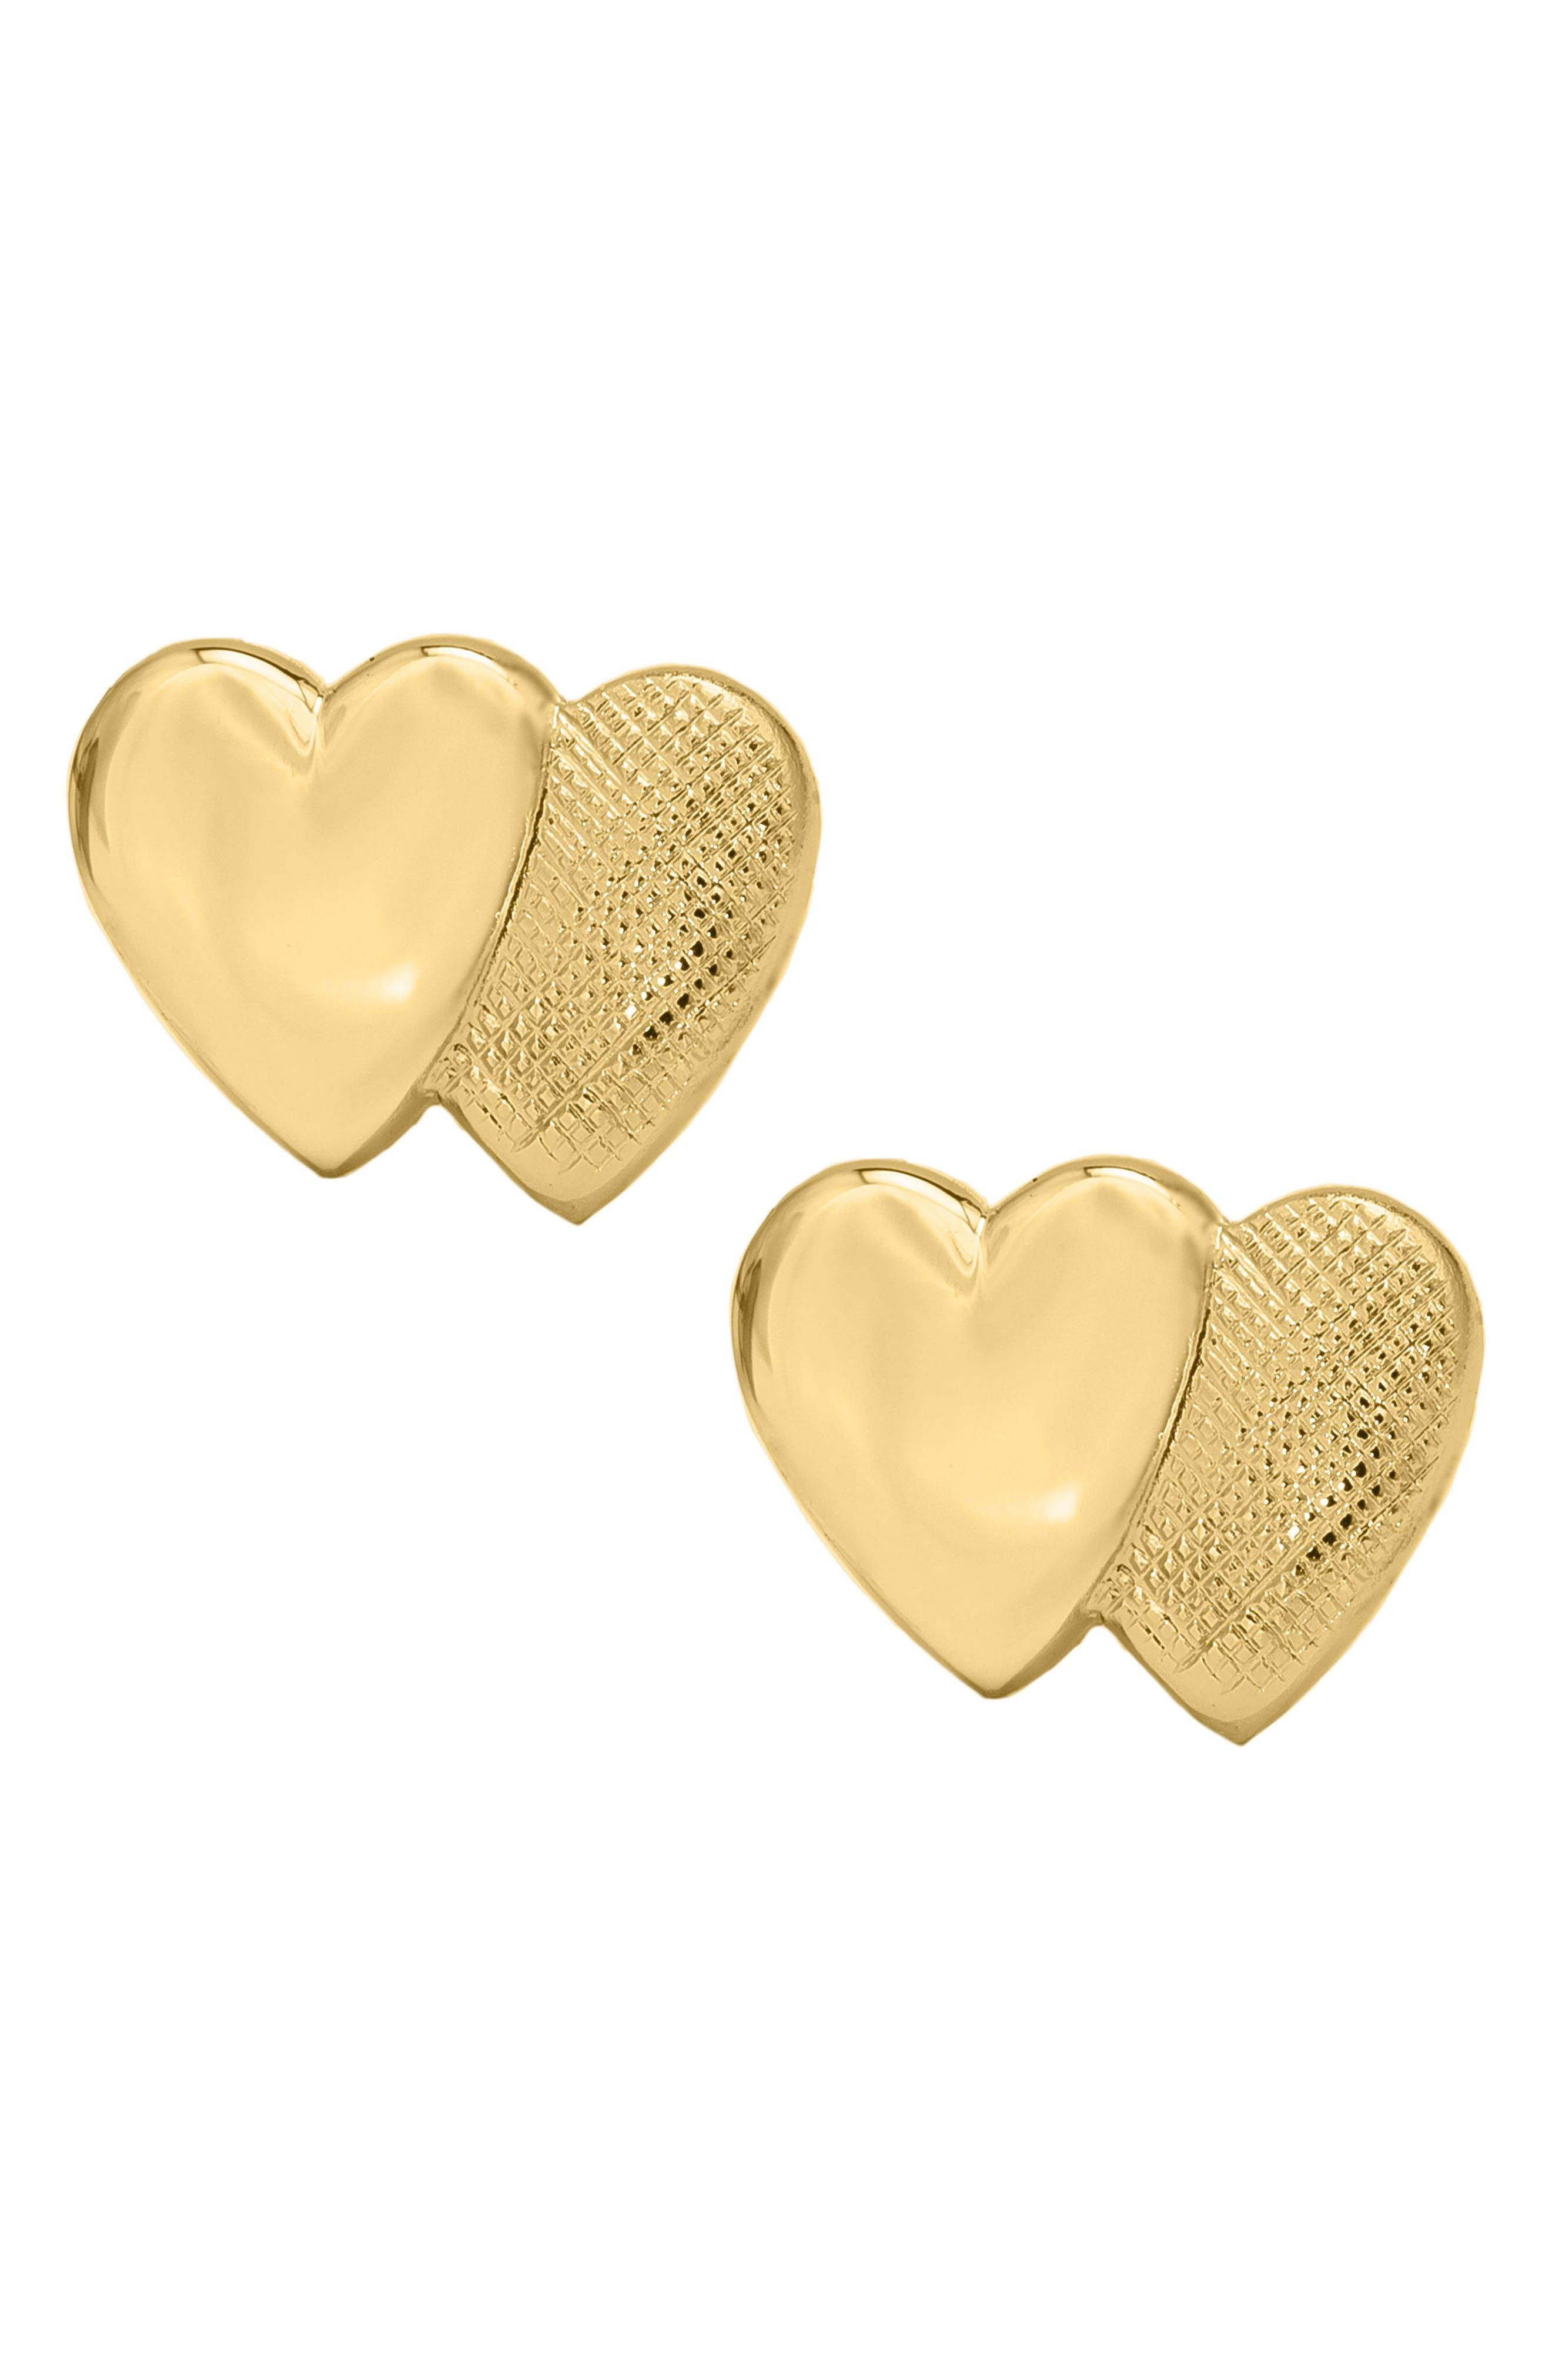 14k Gold Double Heart Earrings,                         Main,                         color, Gold